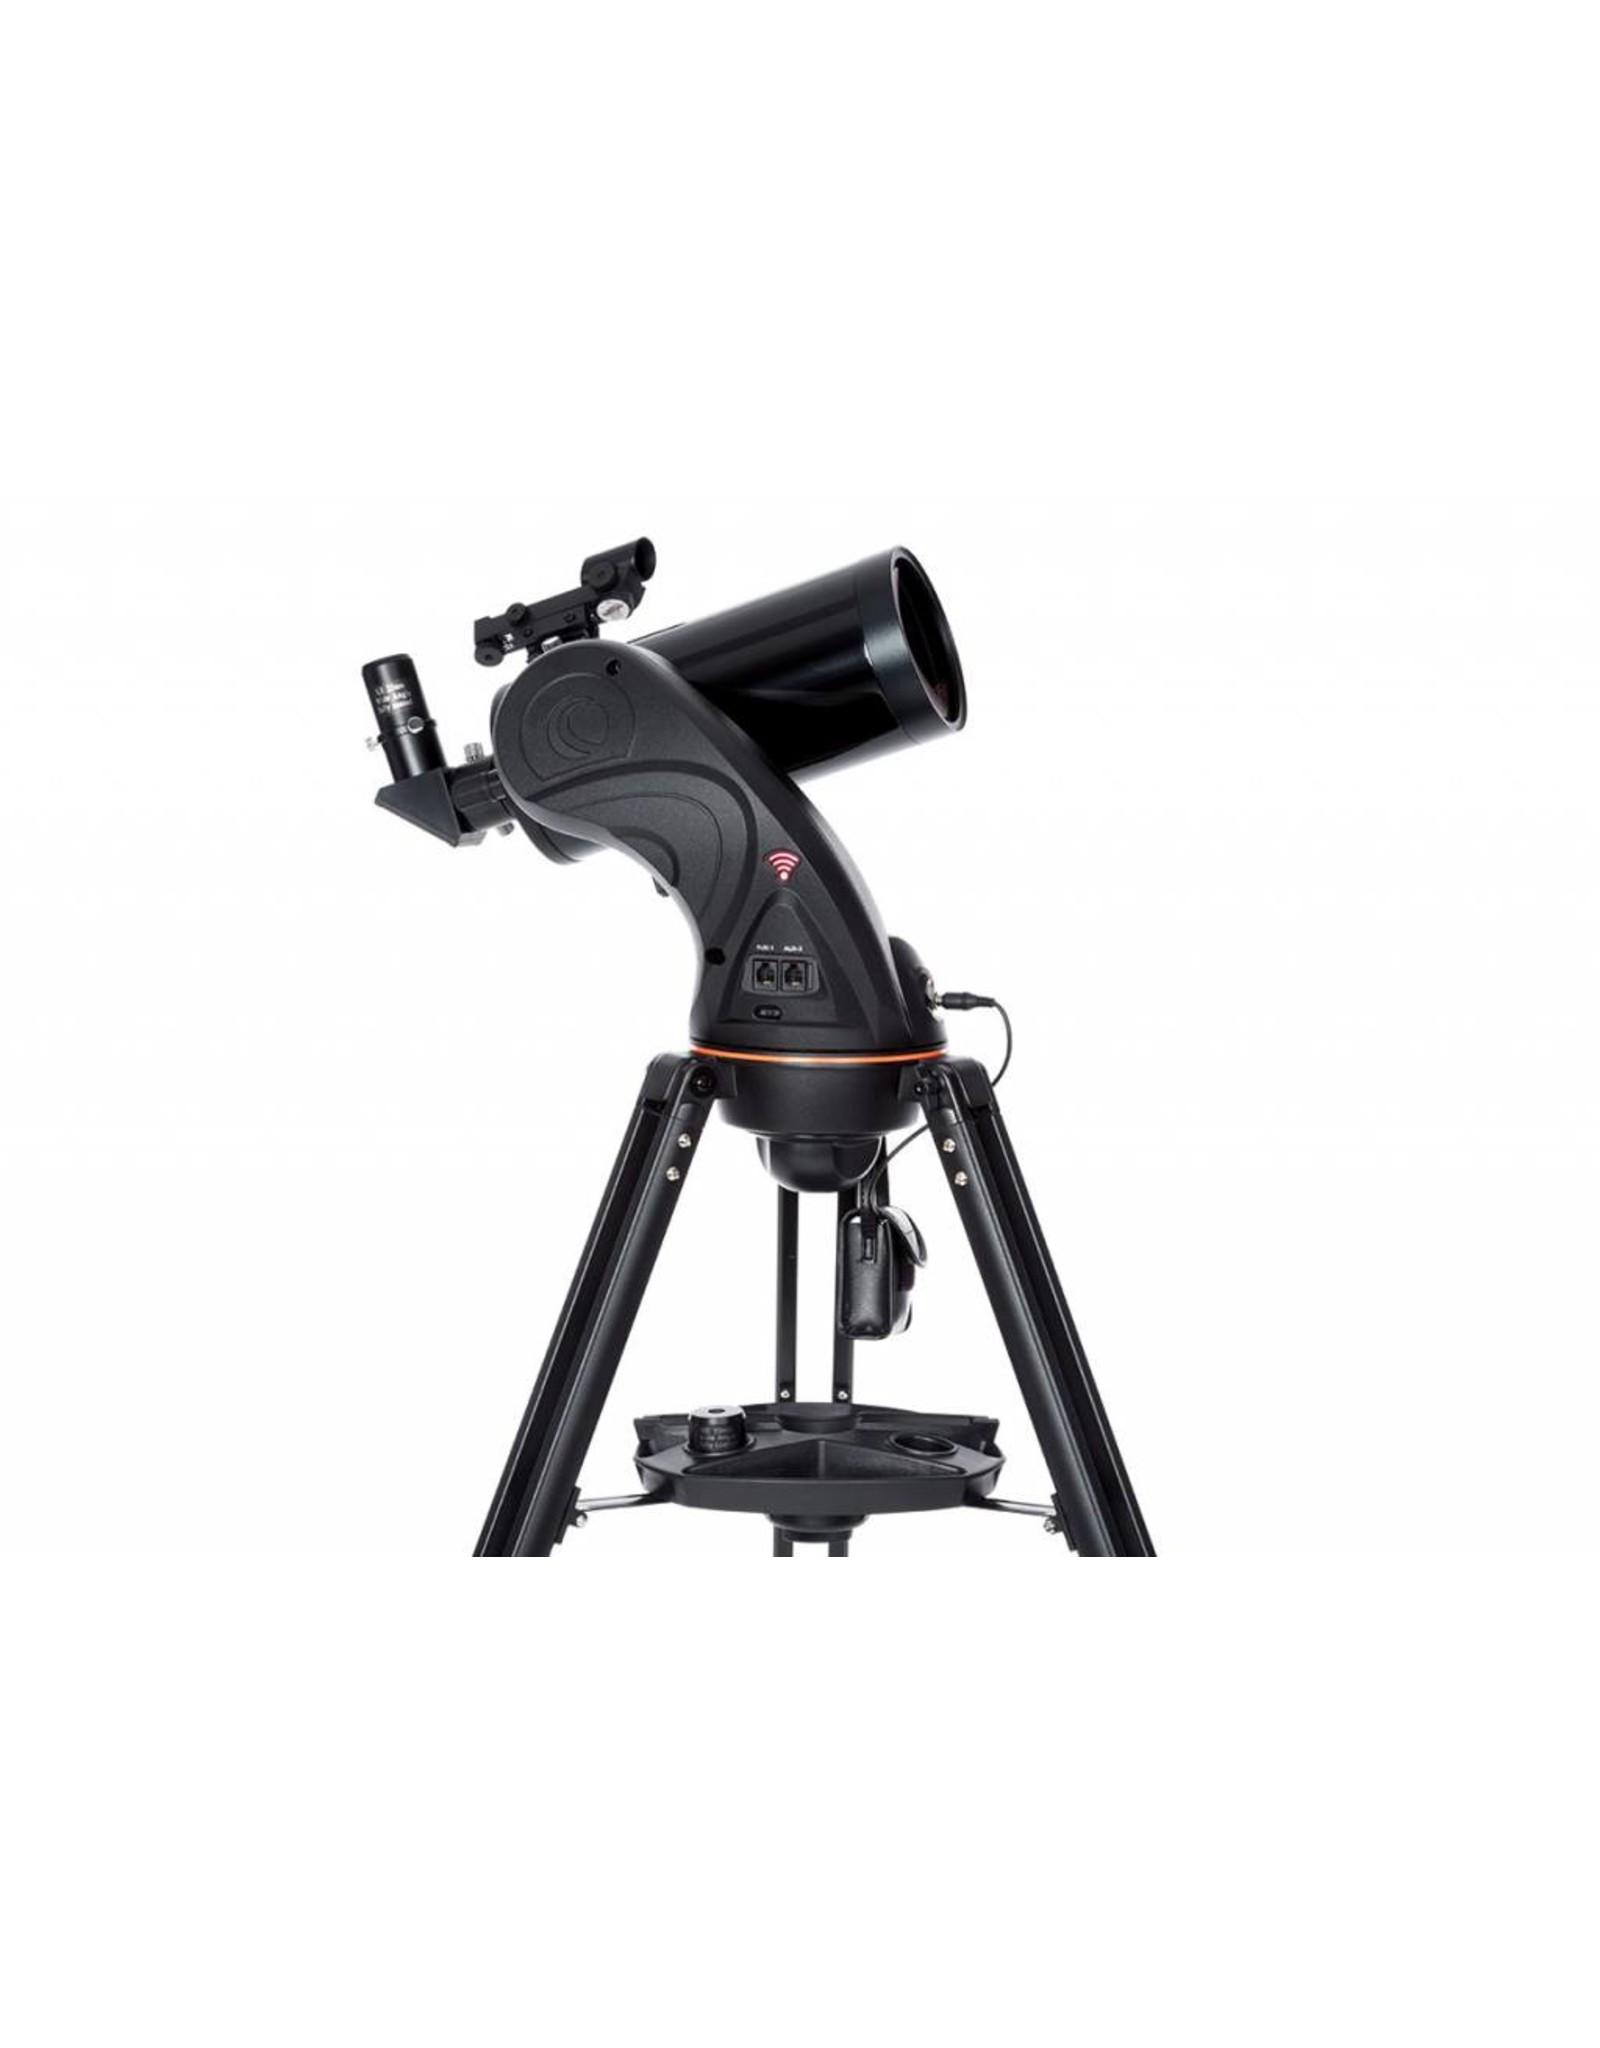 Celestron Celestron Astro Fi 102mm Maksutov-Cassegrain Telescope